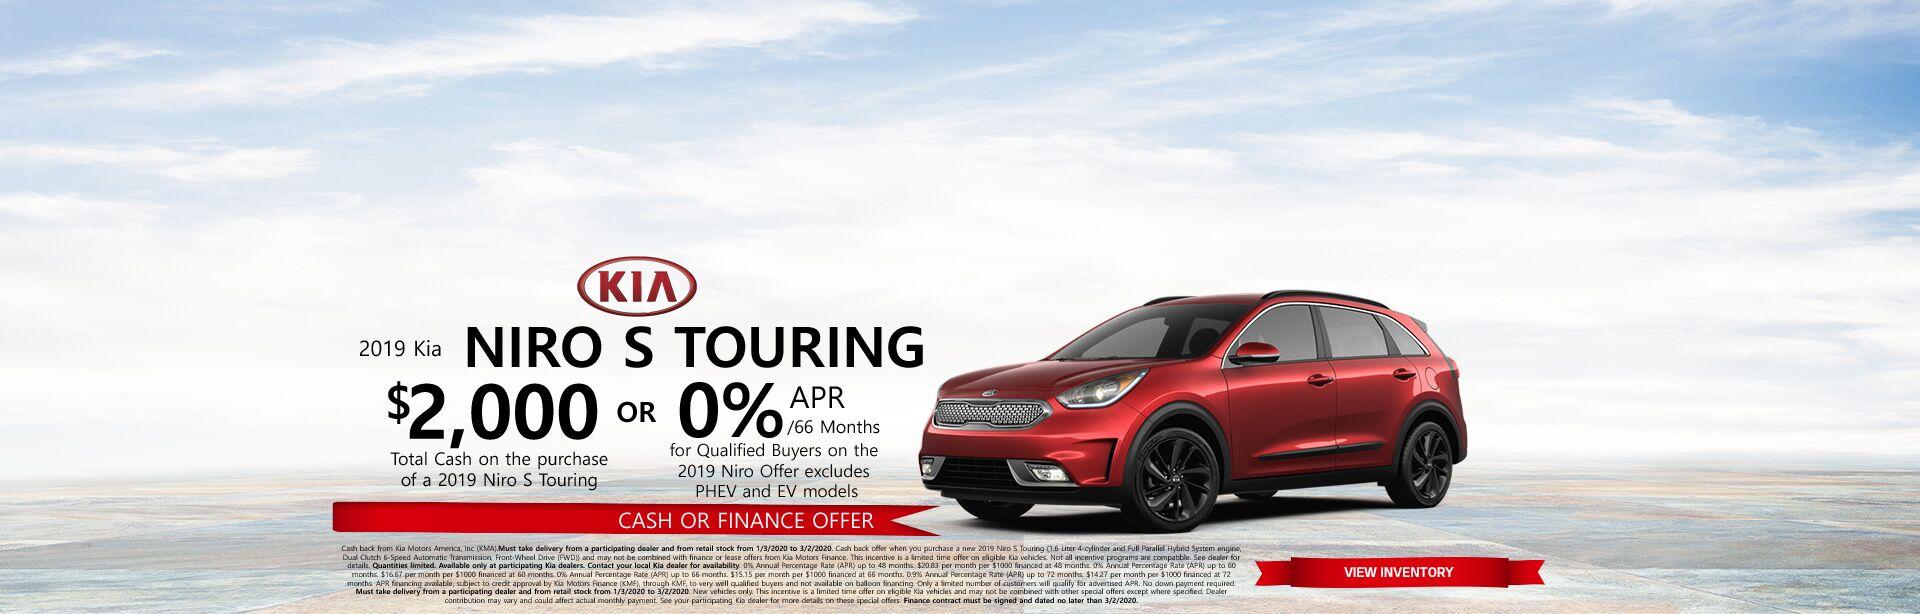 Moritz Kia Fort Worth >> Kia Dealership Fort Worth Tx Used Cars Moritz Kia Ft Worth